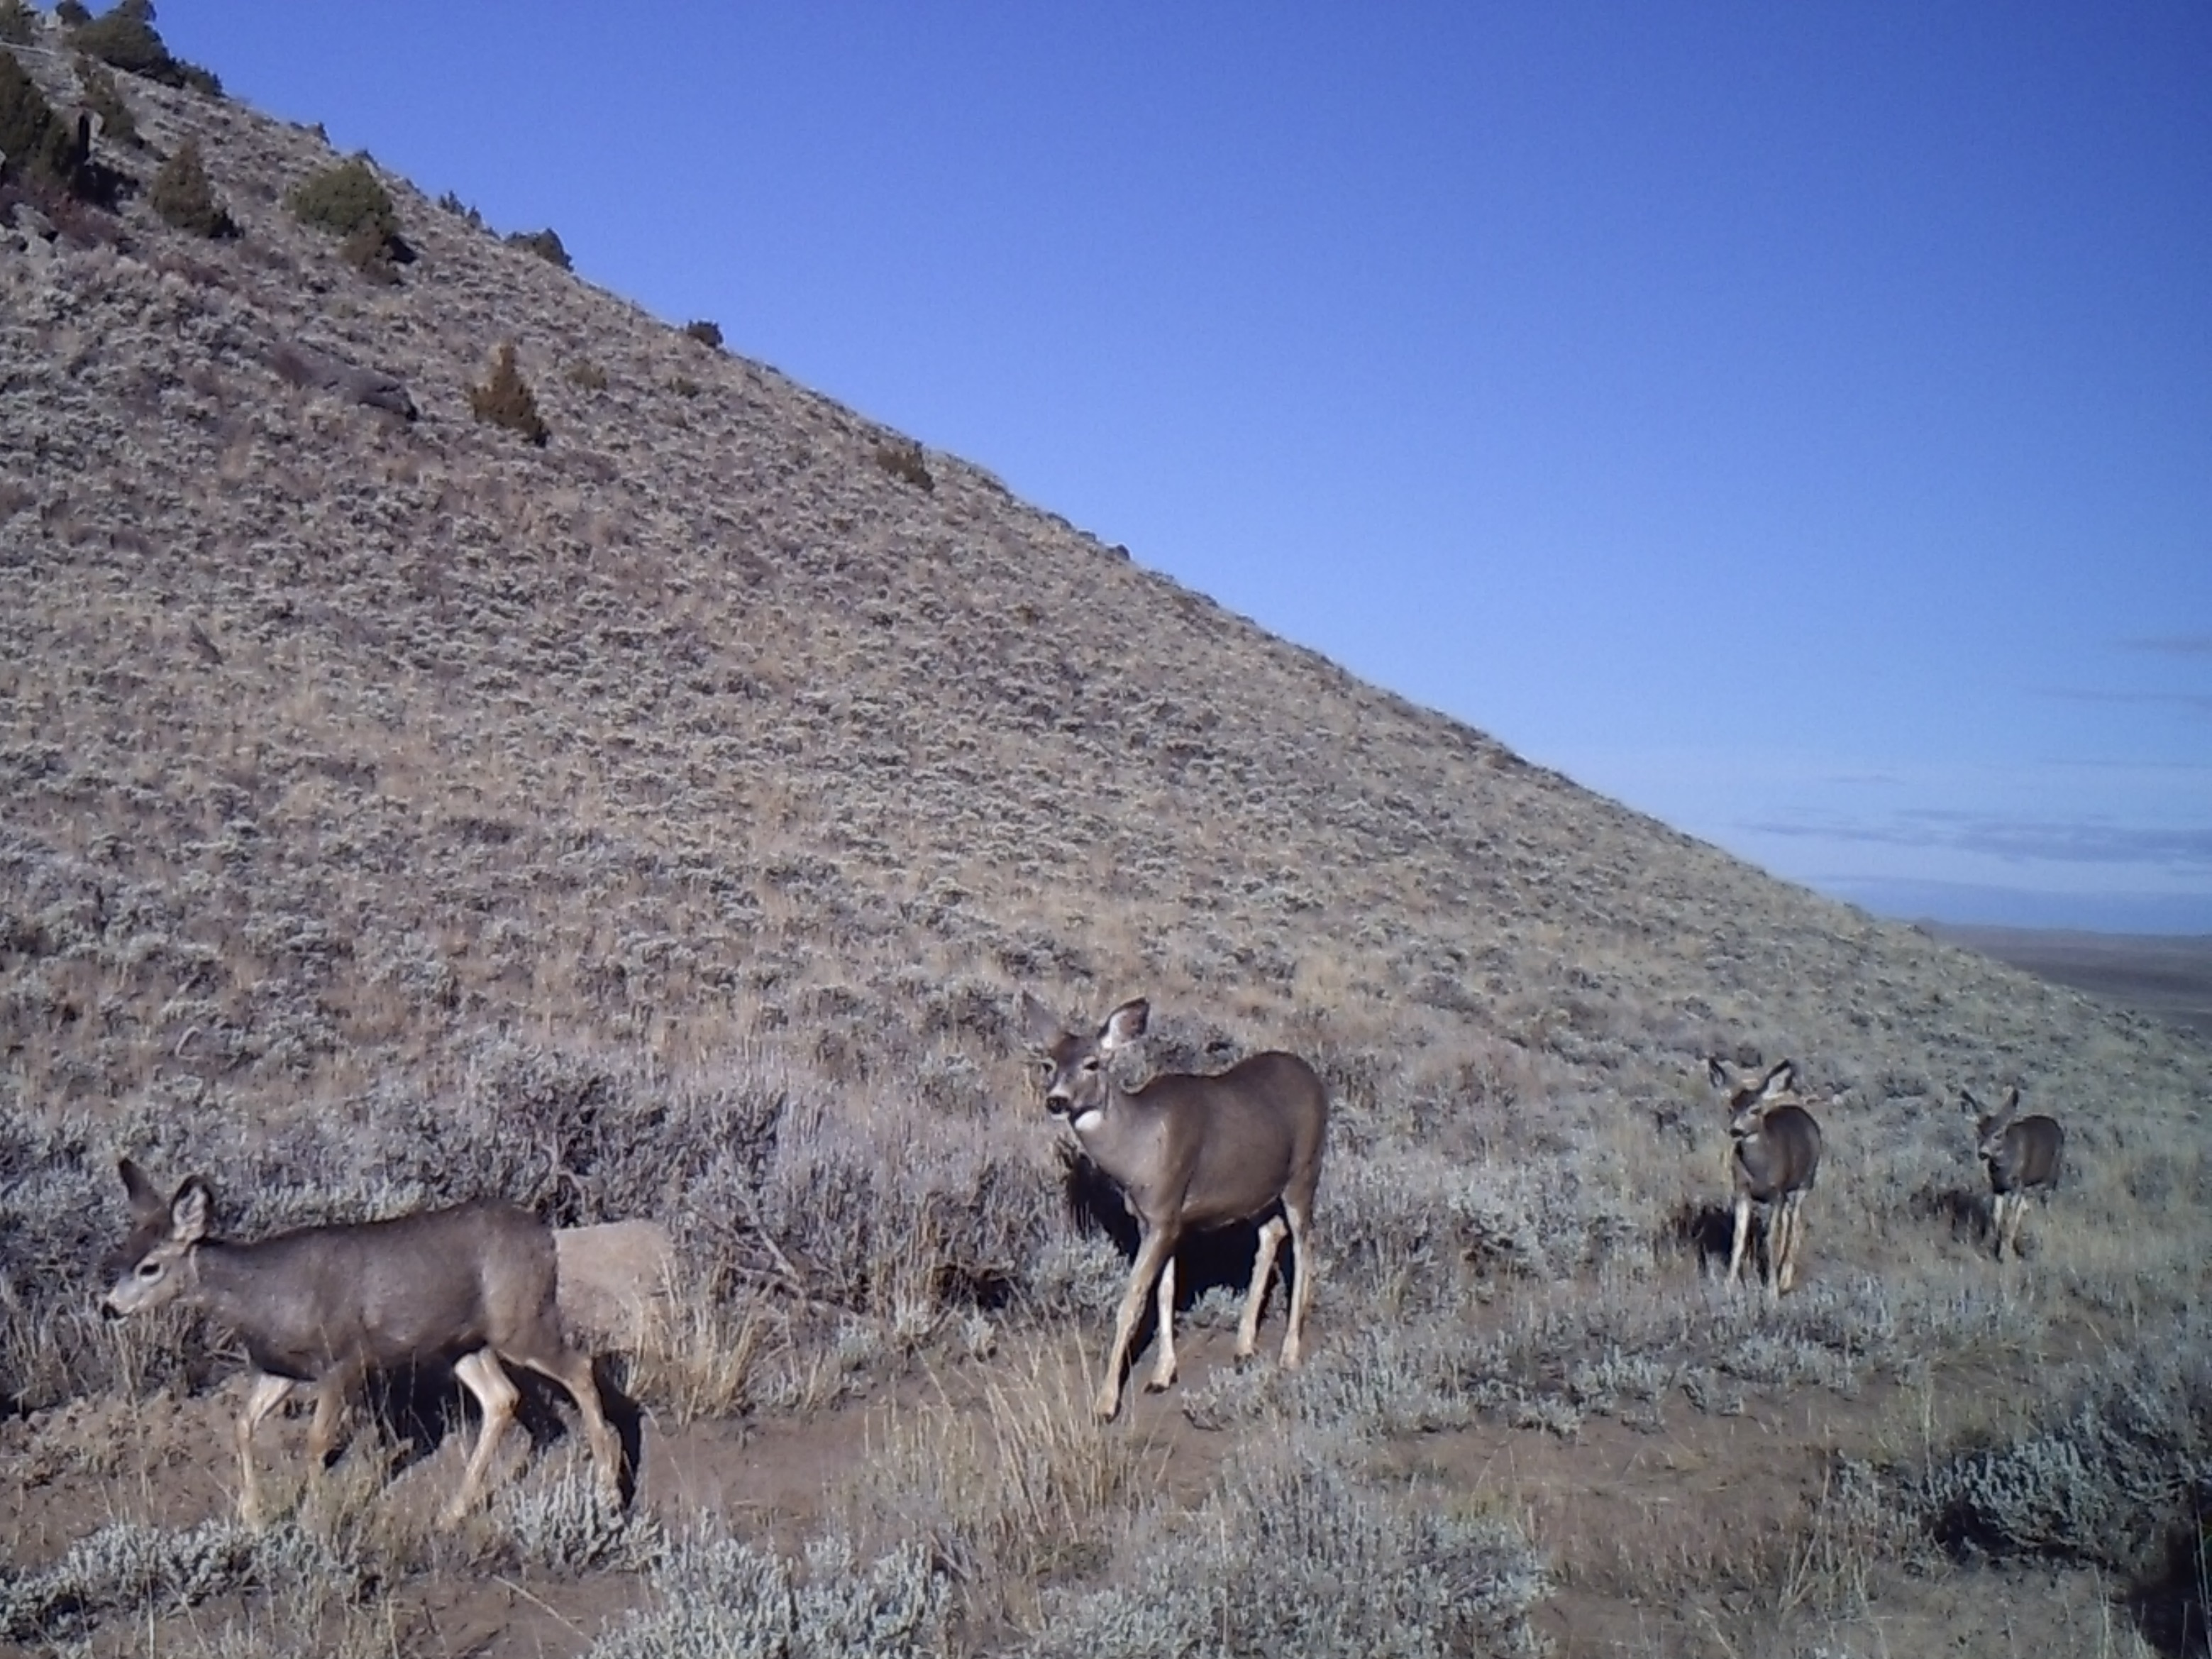 Mule deer photo taken from trail camera - Credit: Matt Kauffman